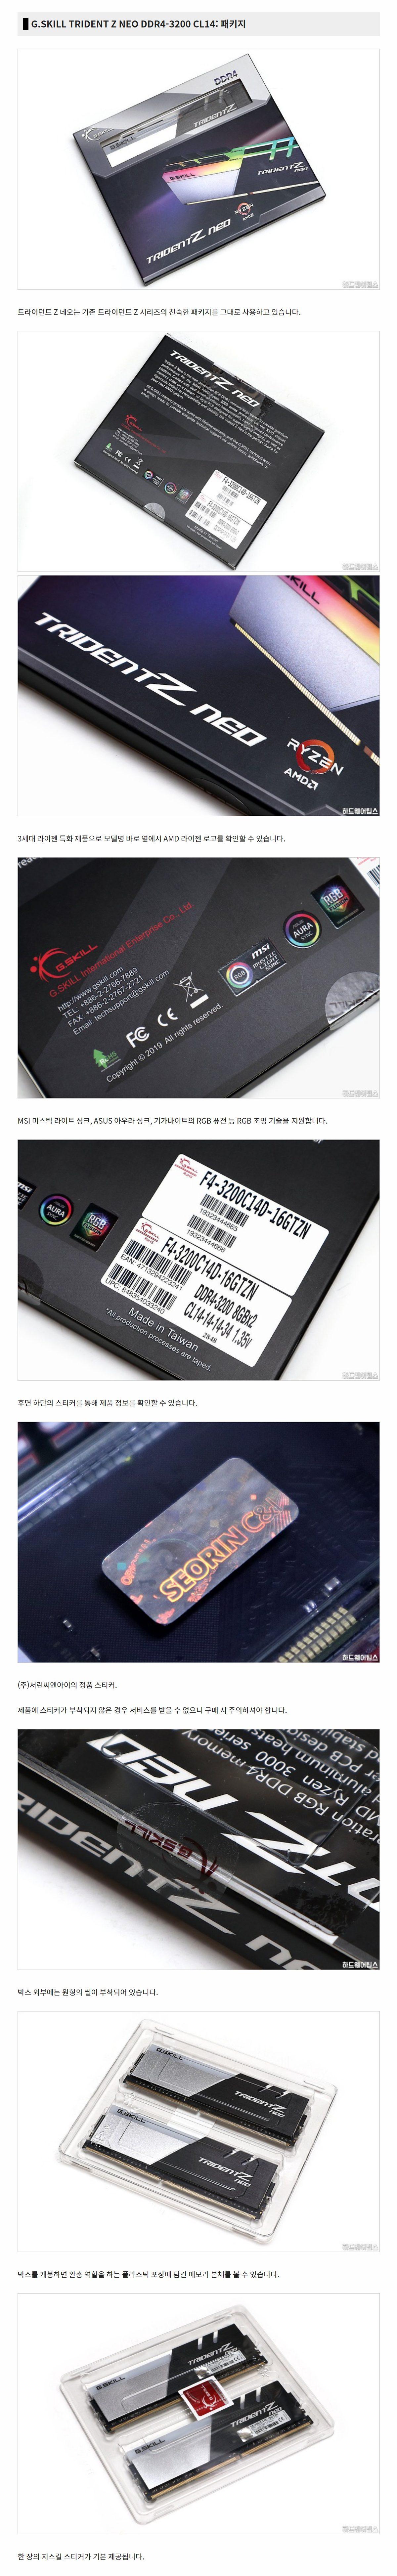 G.SKILL DDR4 16G PC4-25600 CL14 TRIDENT Z NEO (8Gx2) 리뷰 3.jpg